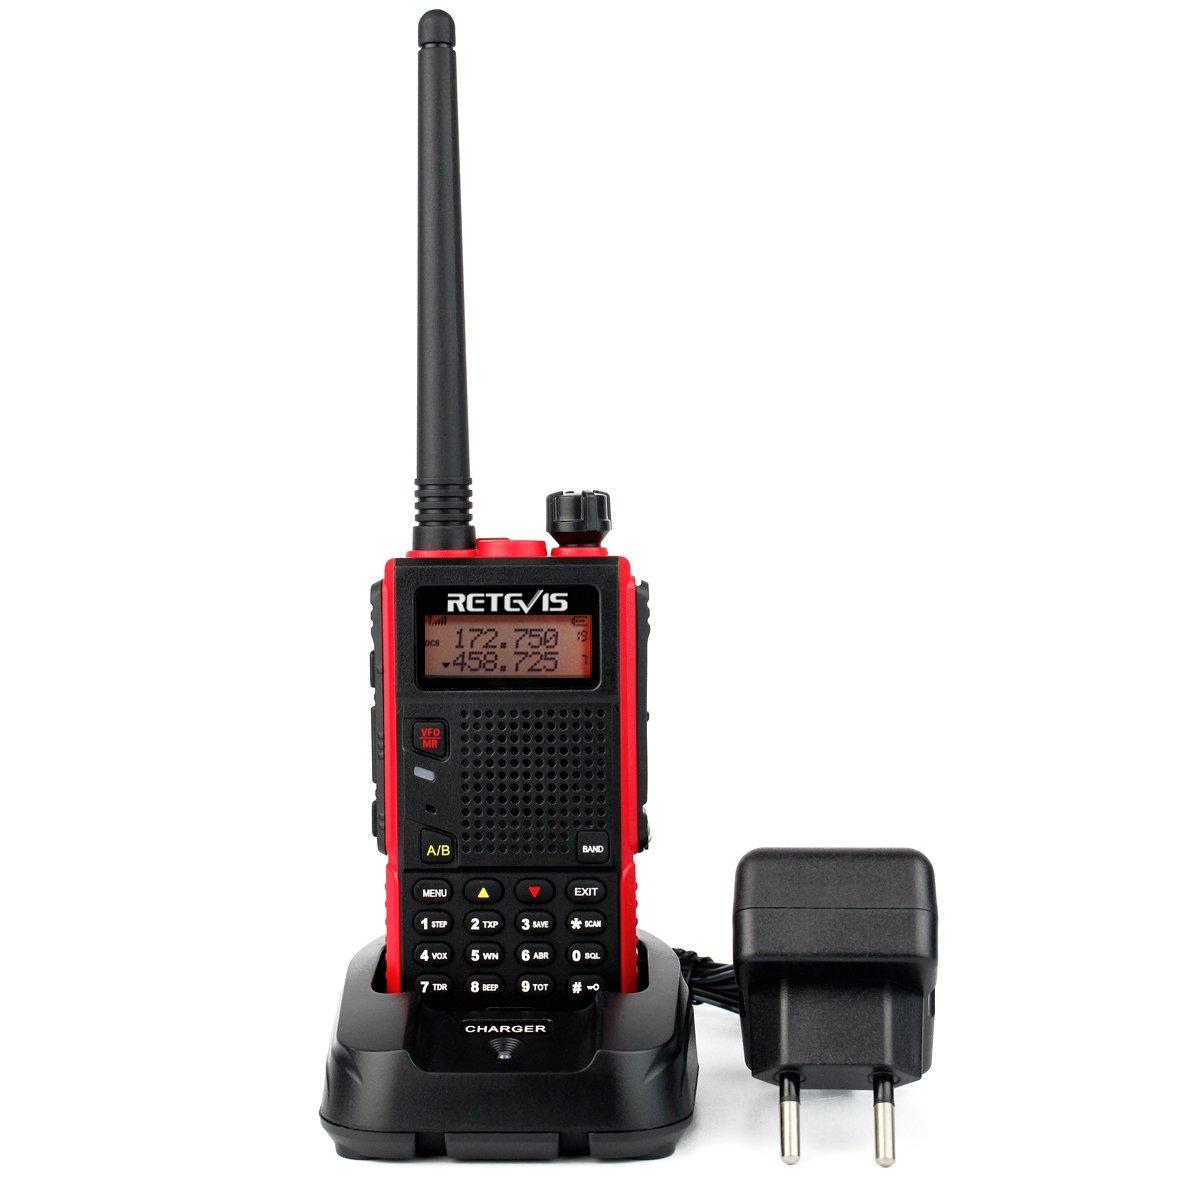 Retevis RT5 Walkie Talkie Banda Dual VHF136-174MHz y UHF400-520MHz Monitor 128 Canales Escanear VOX Radio FM 1750Hz Cargador Europeo Pinganillo Transmisor Negro (Negro y Rojo, 1 Pac) EUA9108A